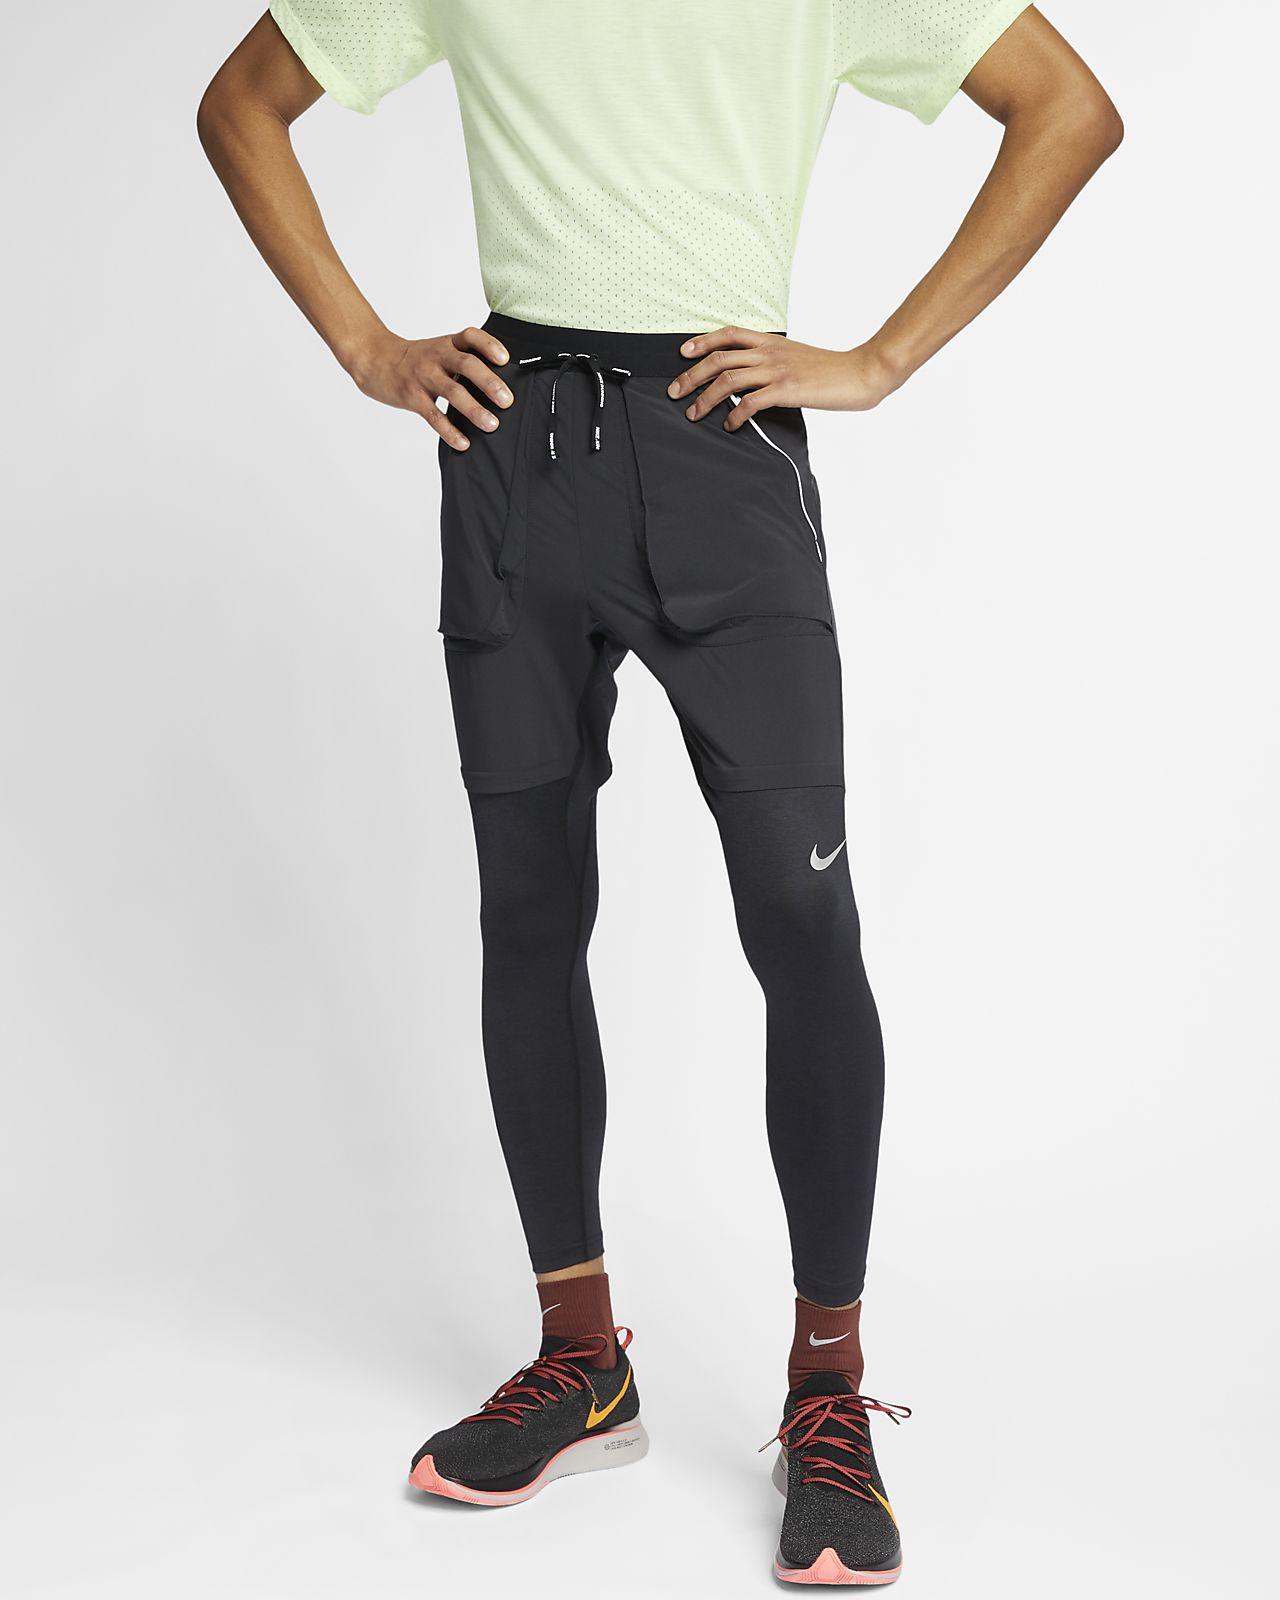 97e3579eff306f Low Resolution Nike Hardloopbroek voor heren Nike Hardloopbroek voor heren